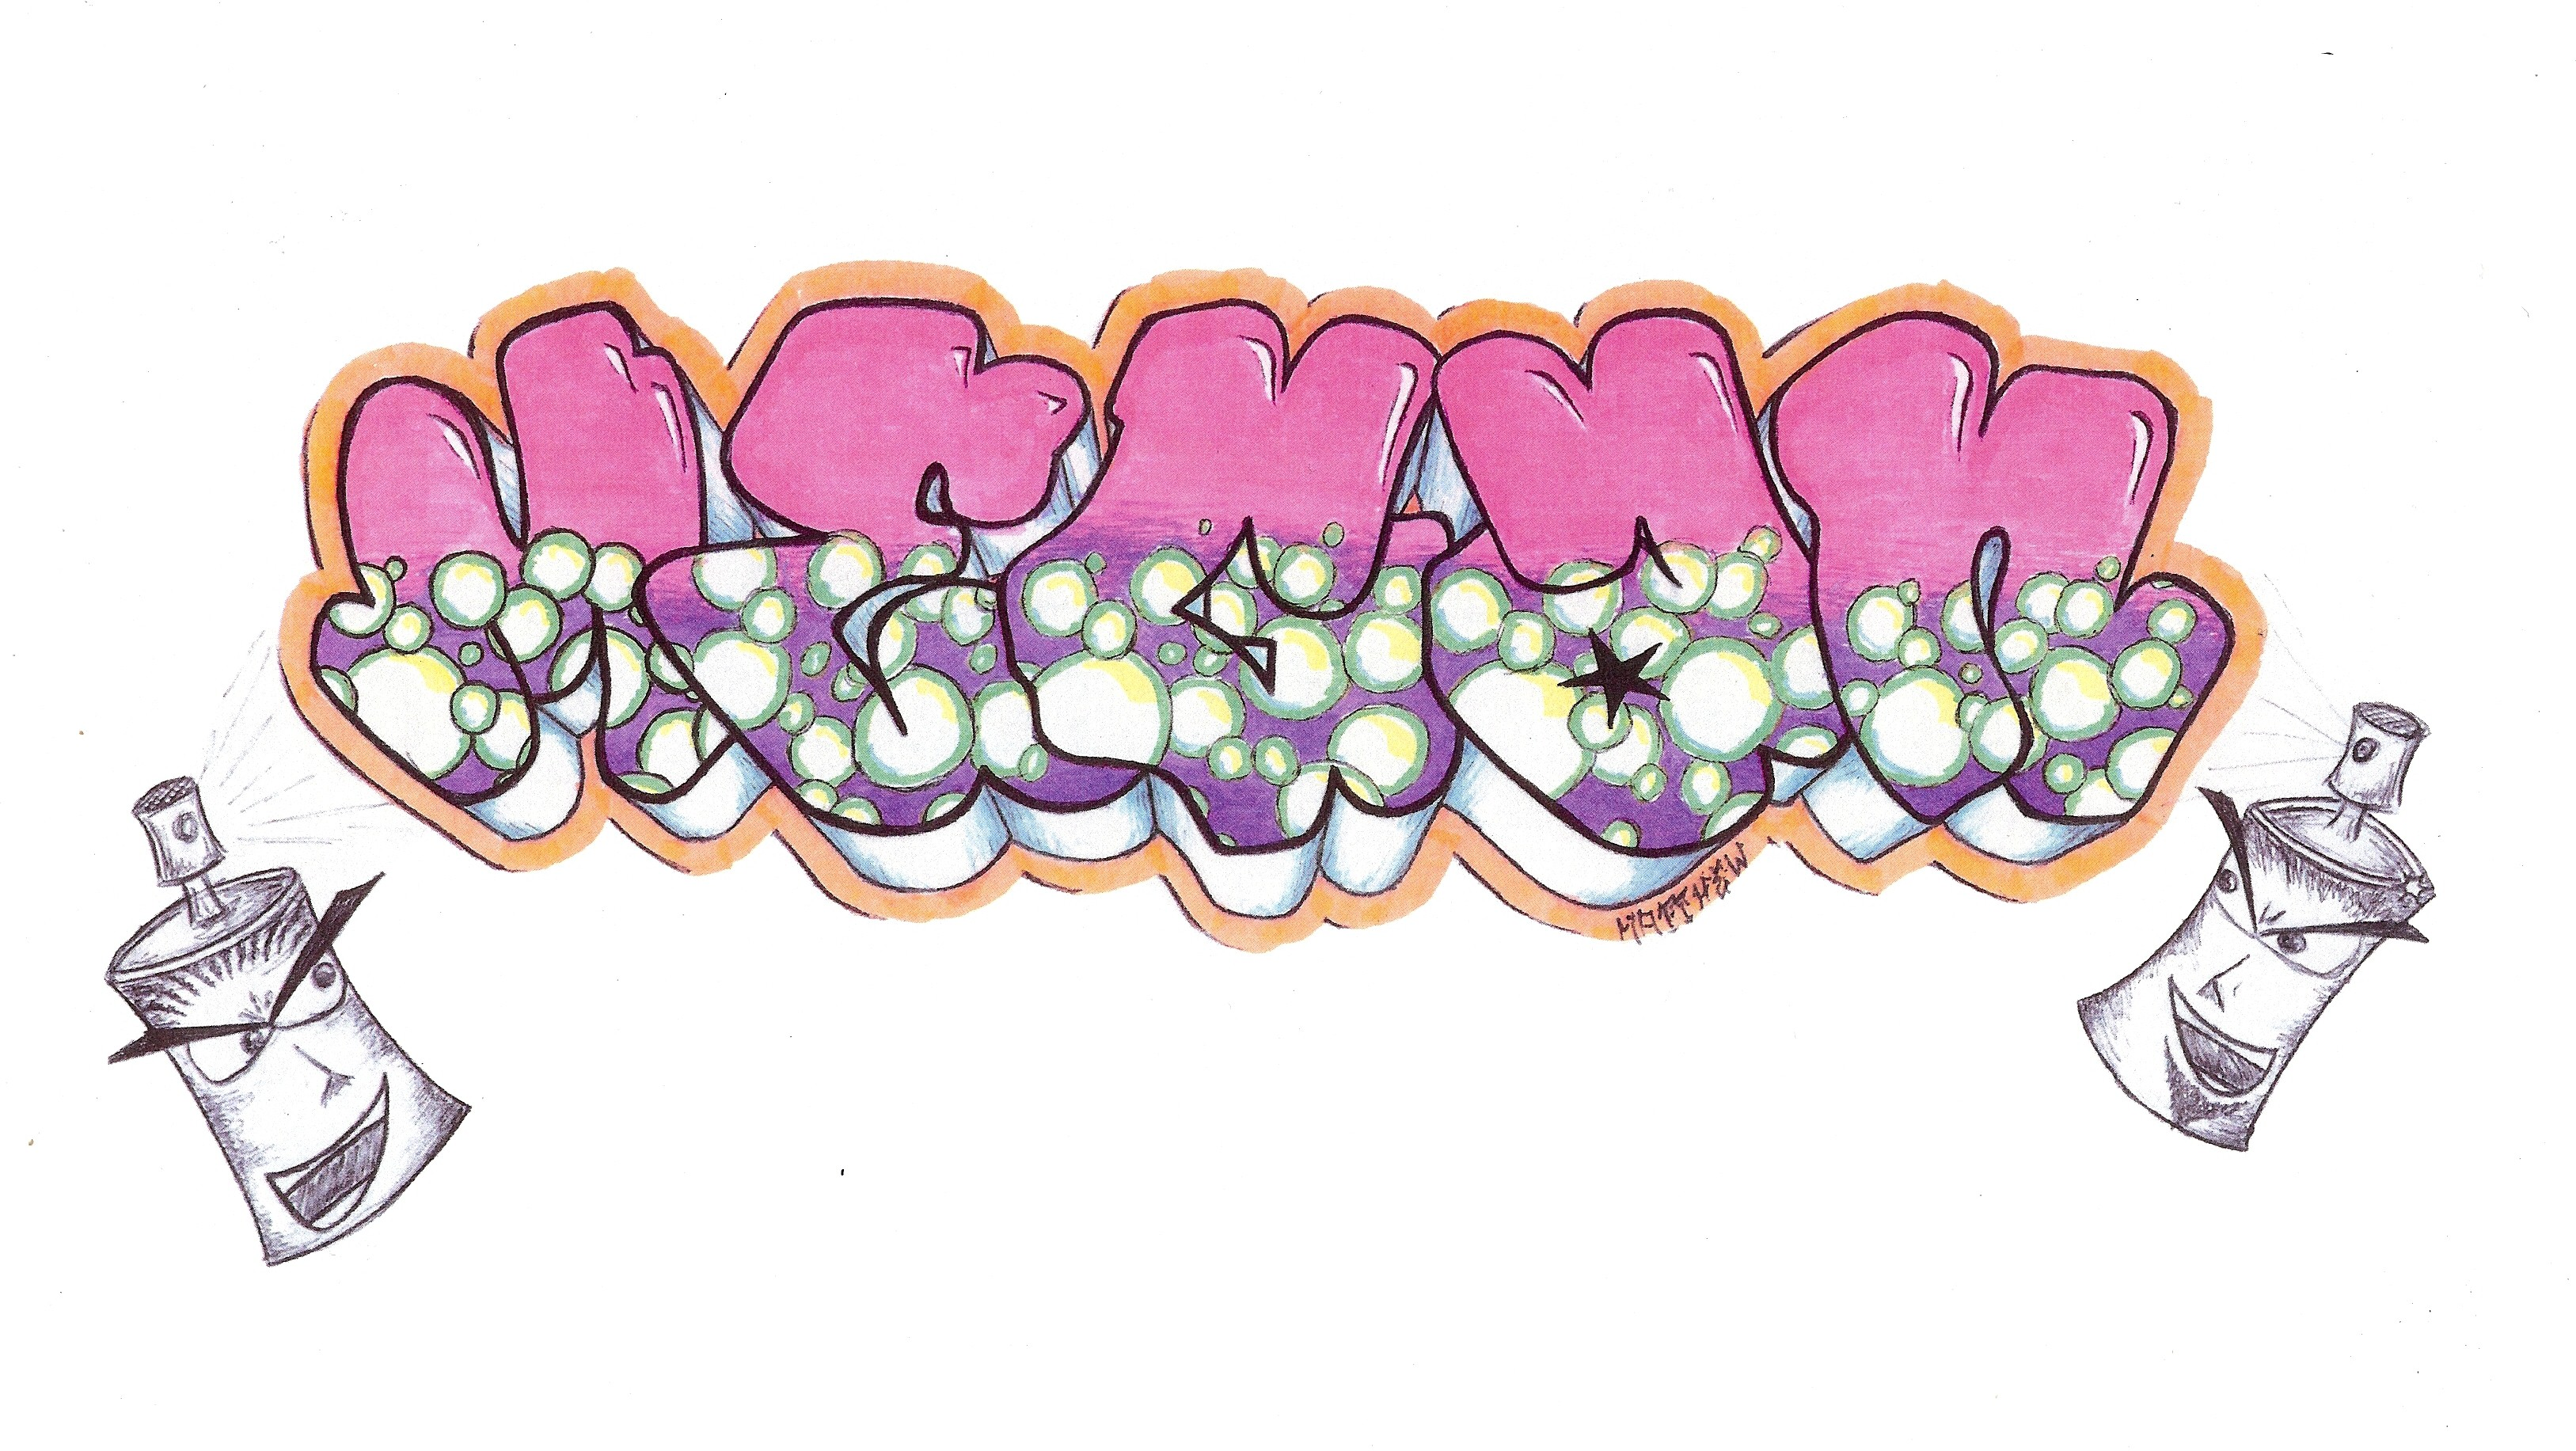 Megan Graffiti By Mhelms12 On Deviantart